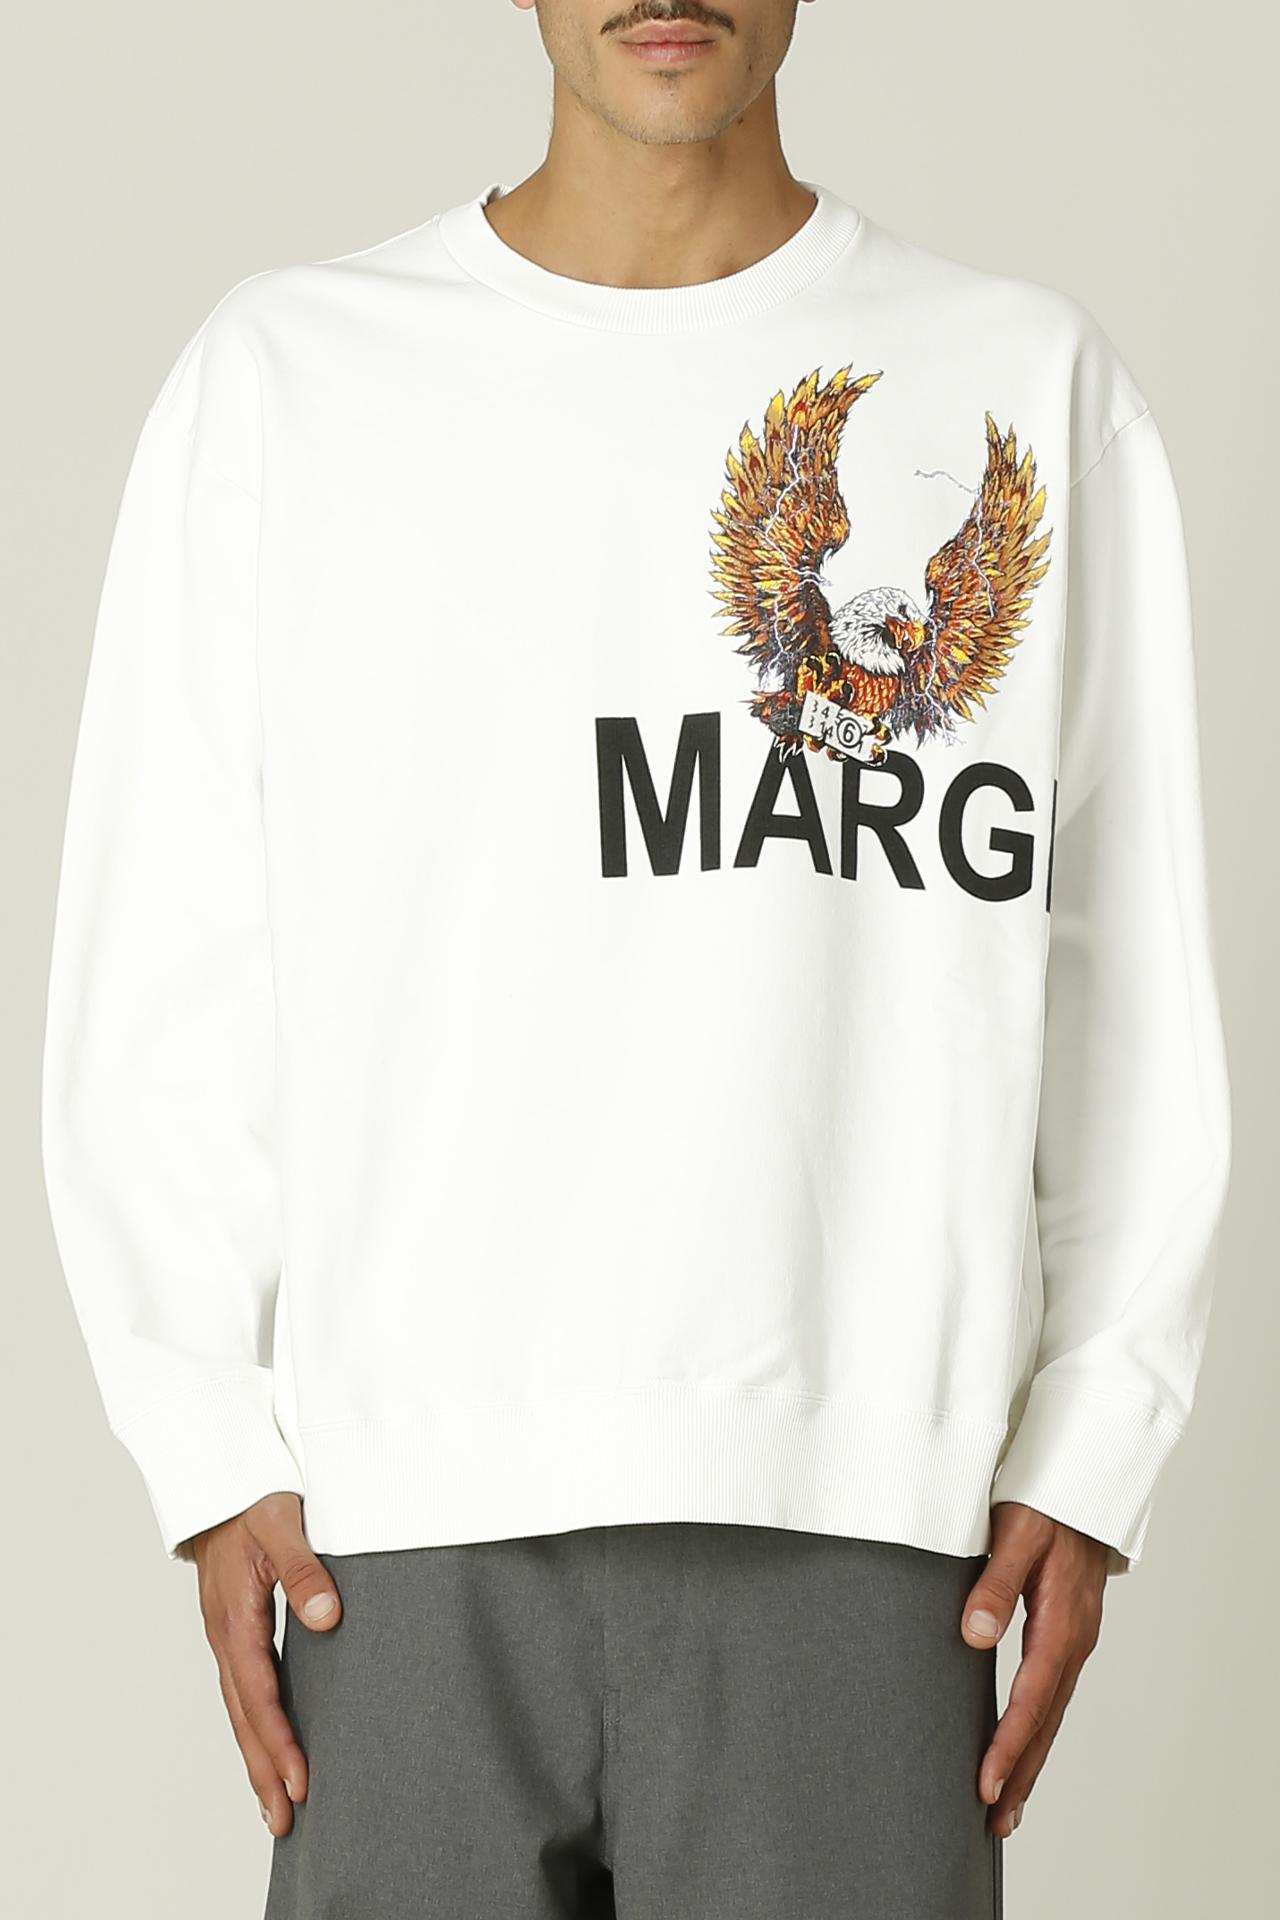 MM6 MAISON MARGIELA      S52GU0141S25337B